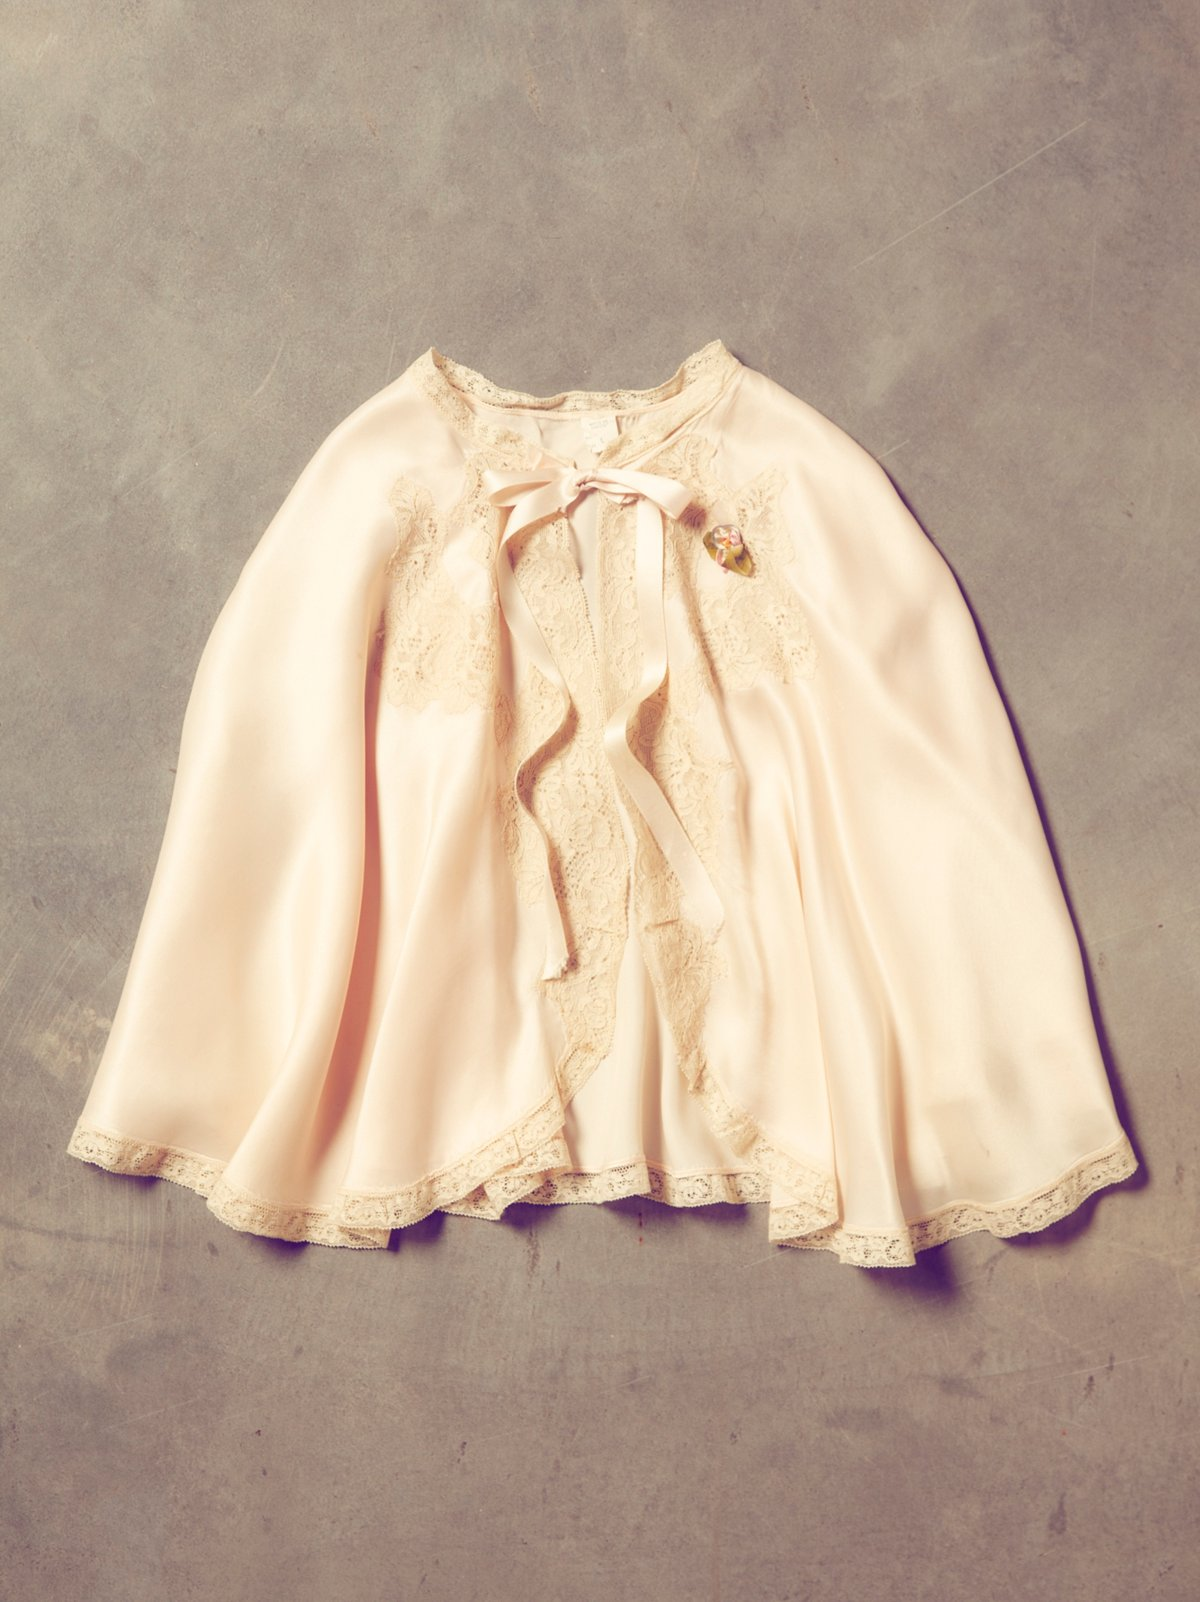 Vintage 1950s Apron Dance Skirt